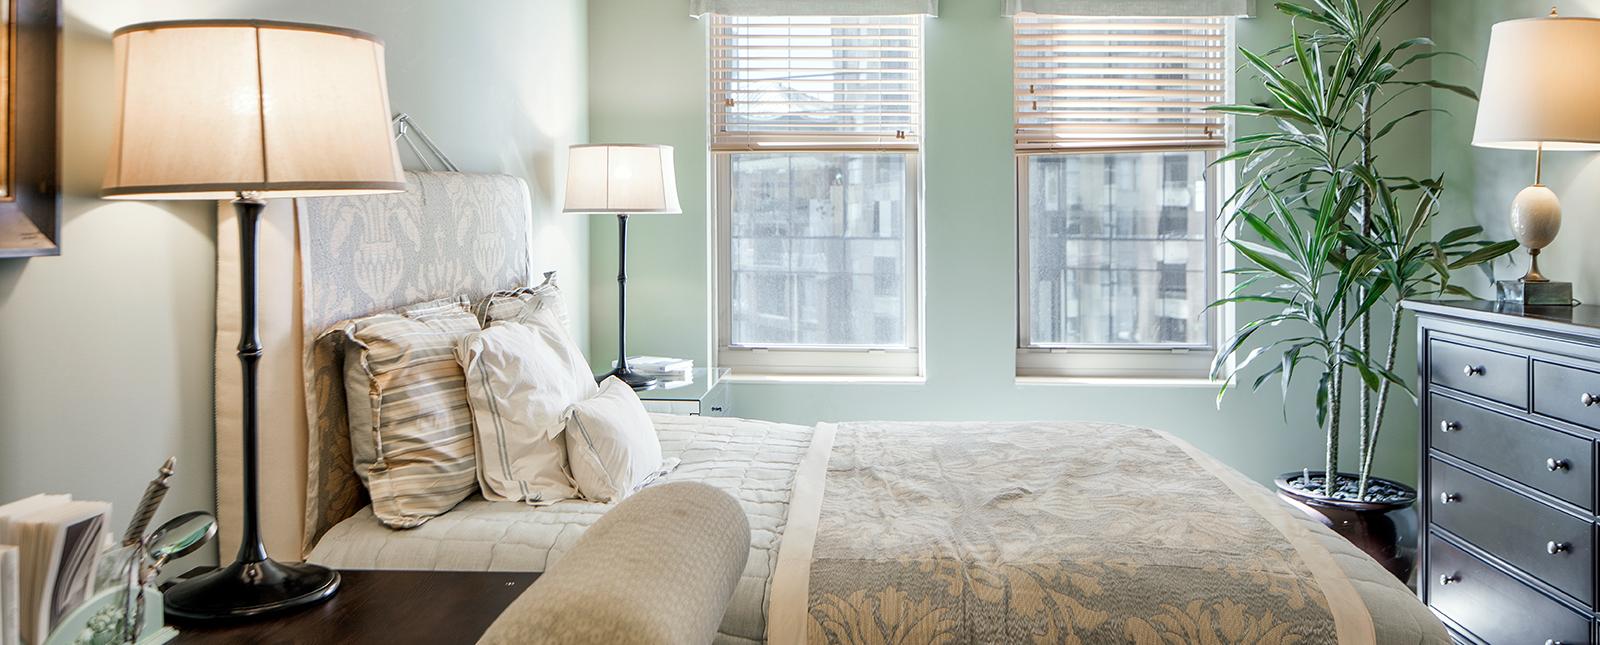 Bedroom at Spinnaker Bay Serviced Apartments